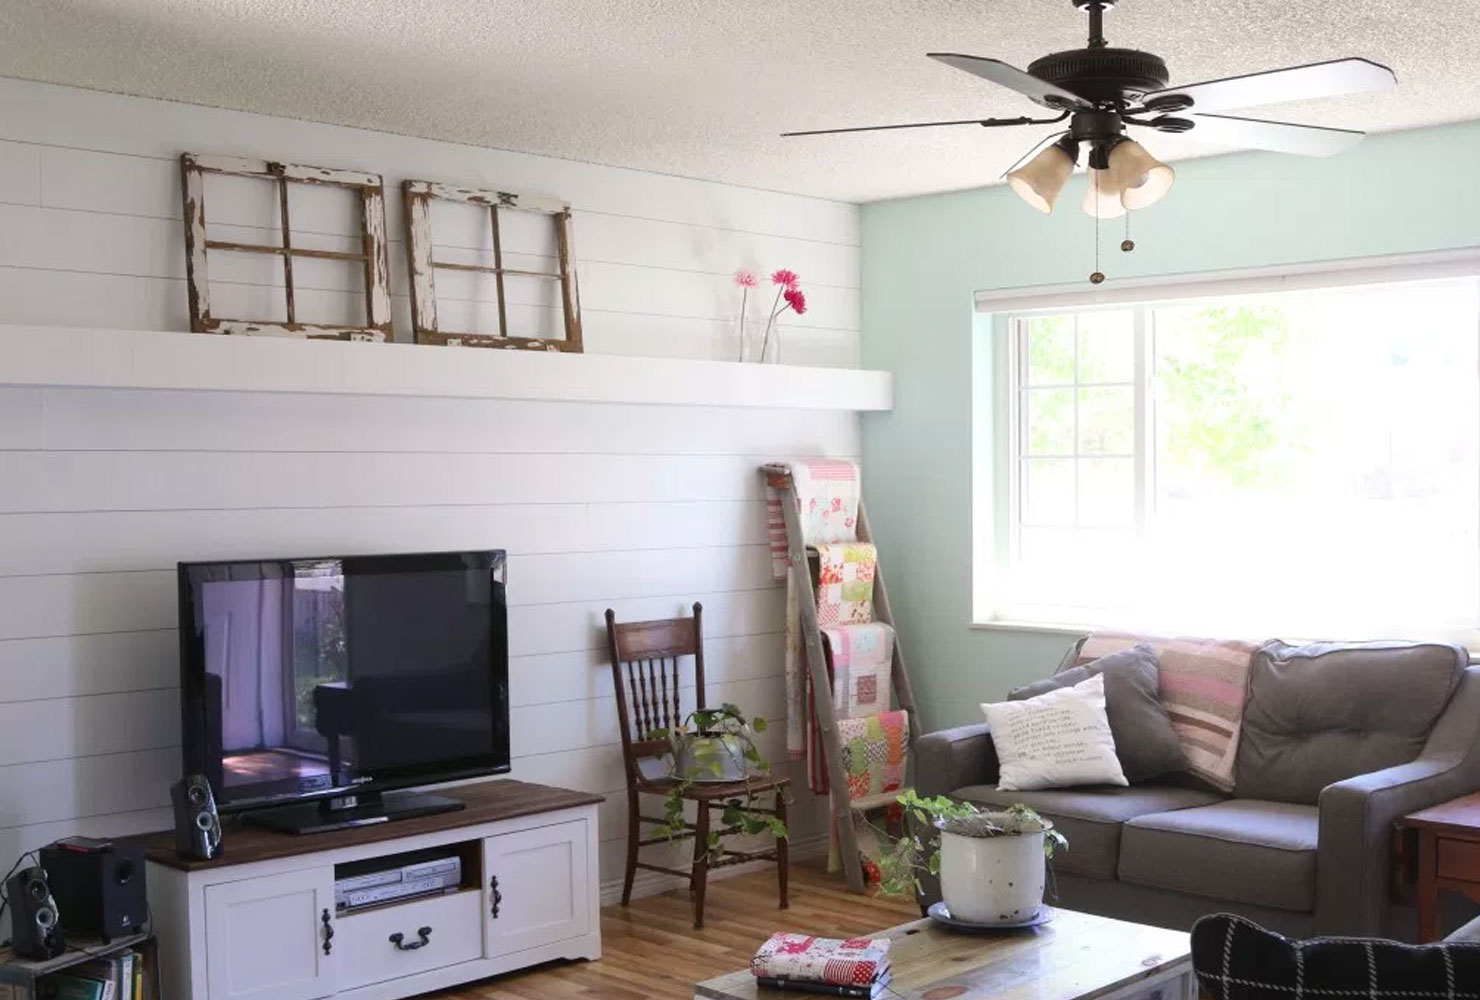 Fullsize Of Rustic Diy Home Decor